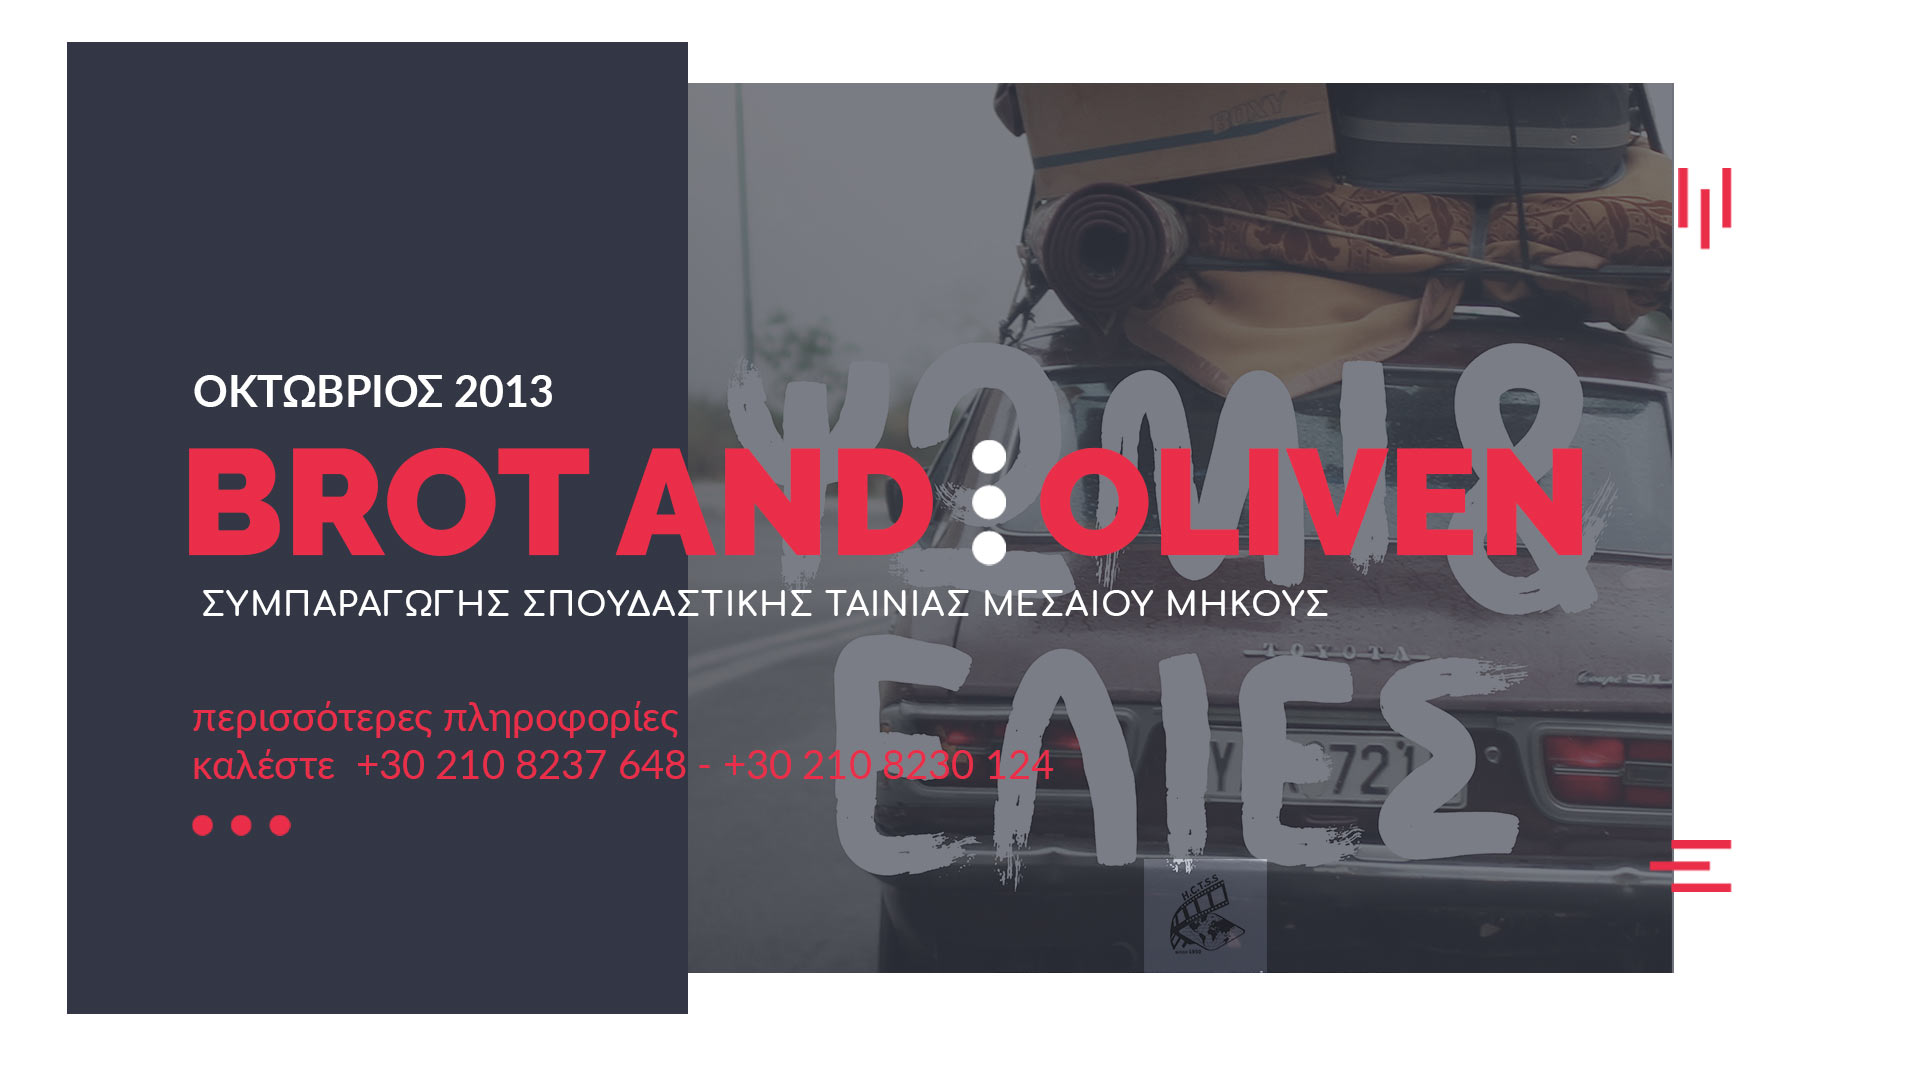 """Brot and Oliven Project"" – Ελληνογερμανική Σπουδαστική Ταινία"